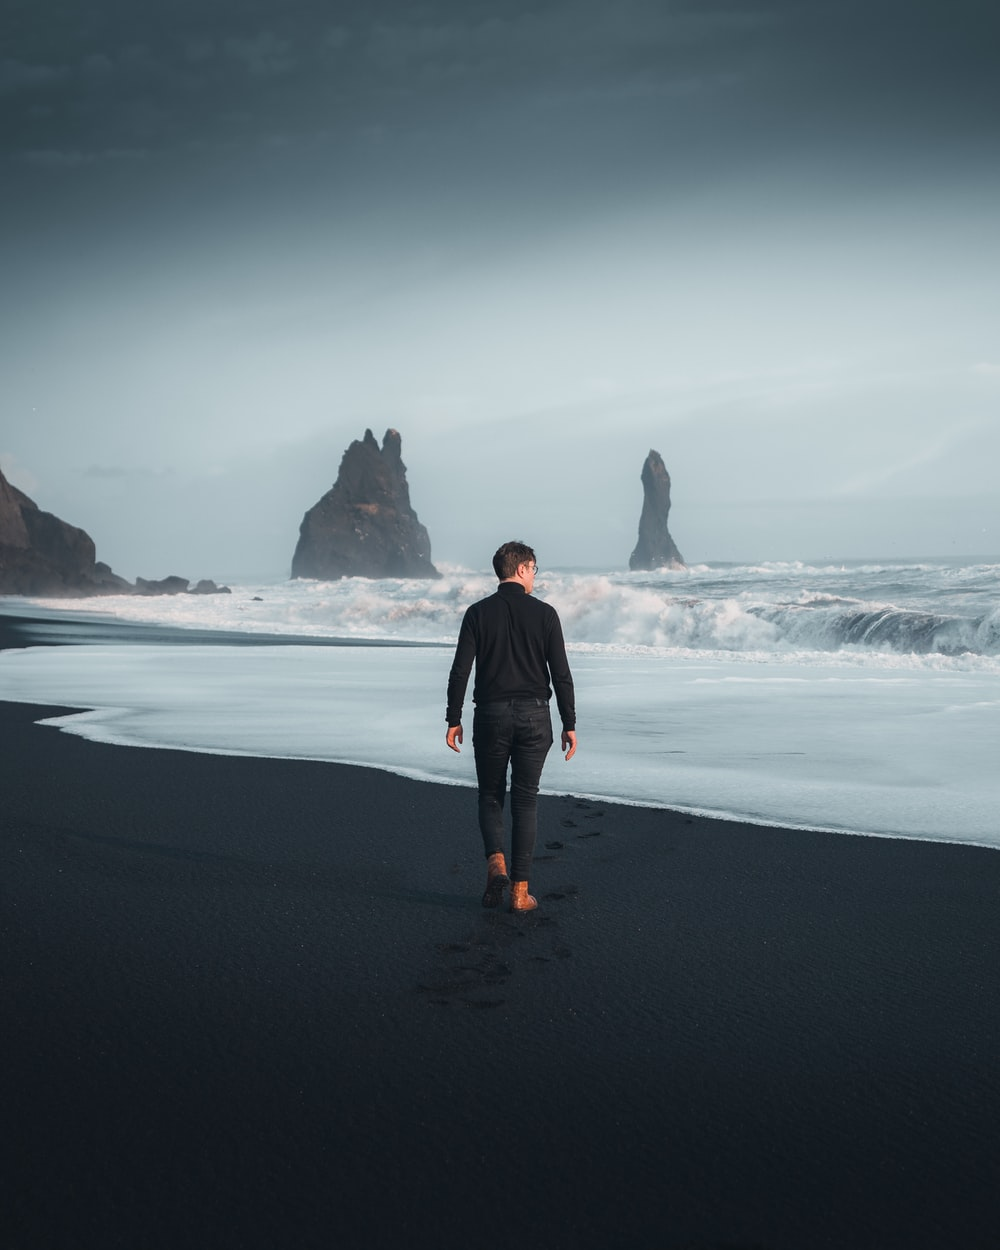 man in black jacket standing on seashore during daytime